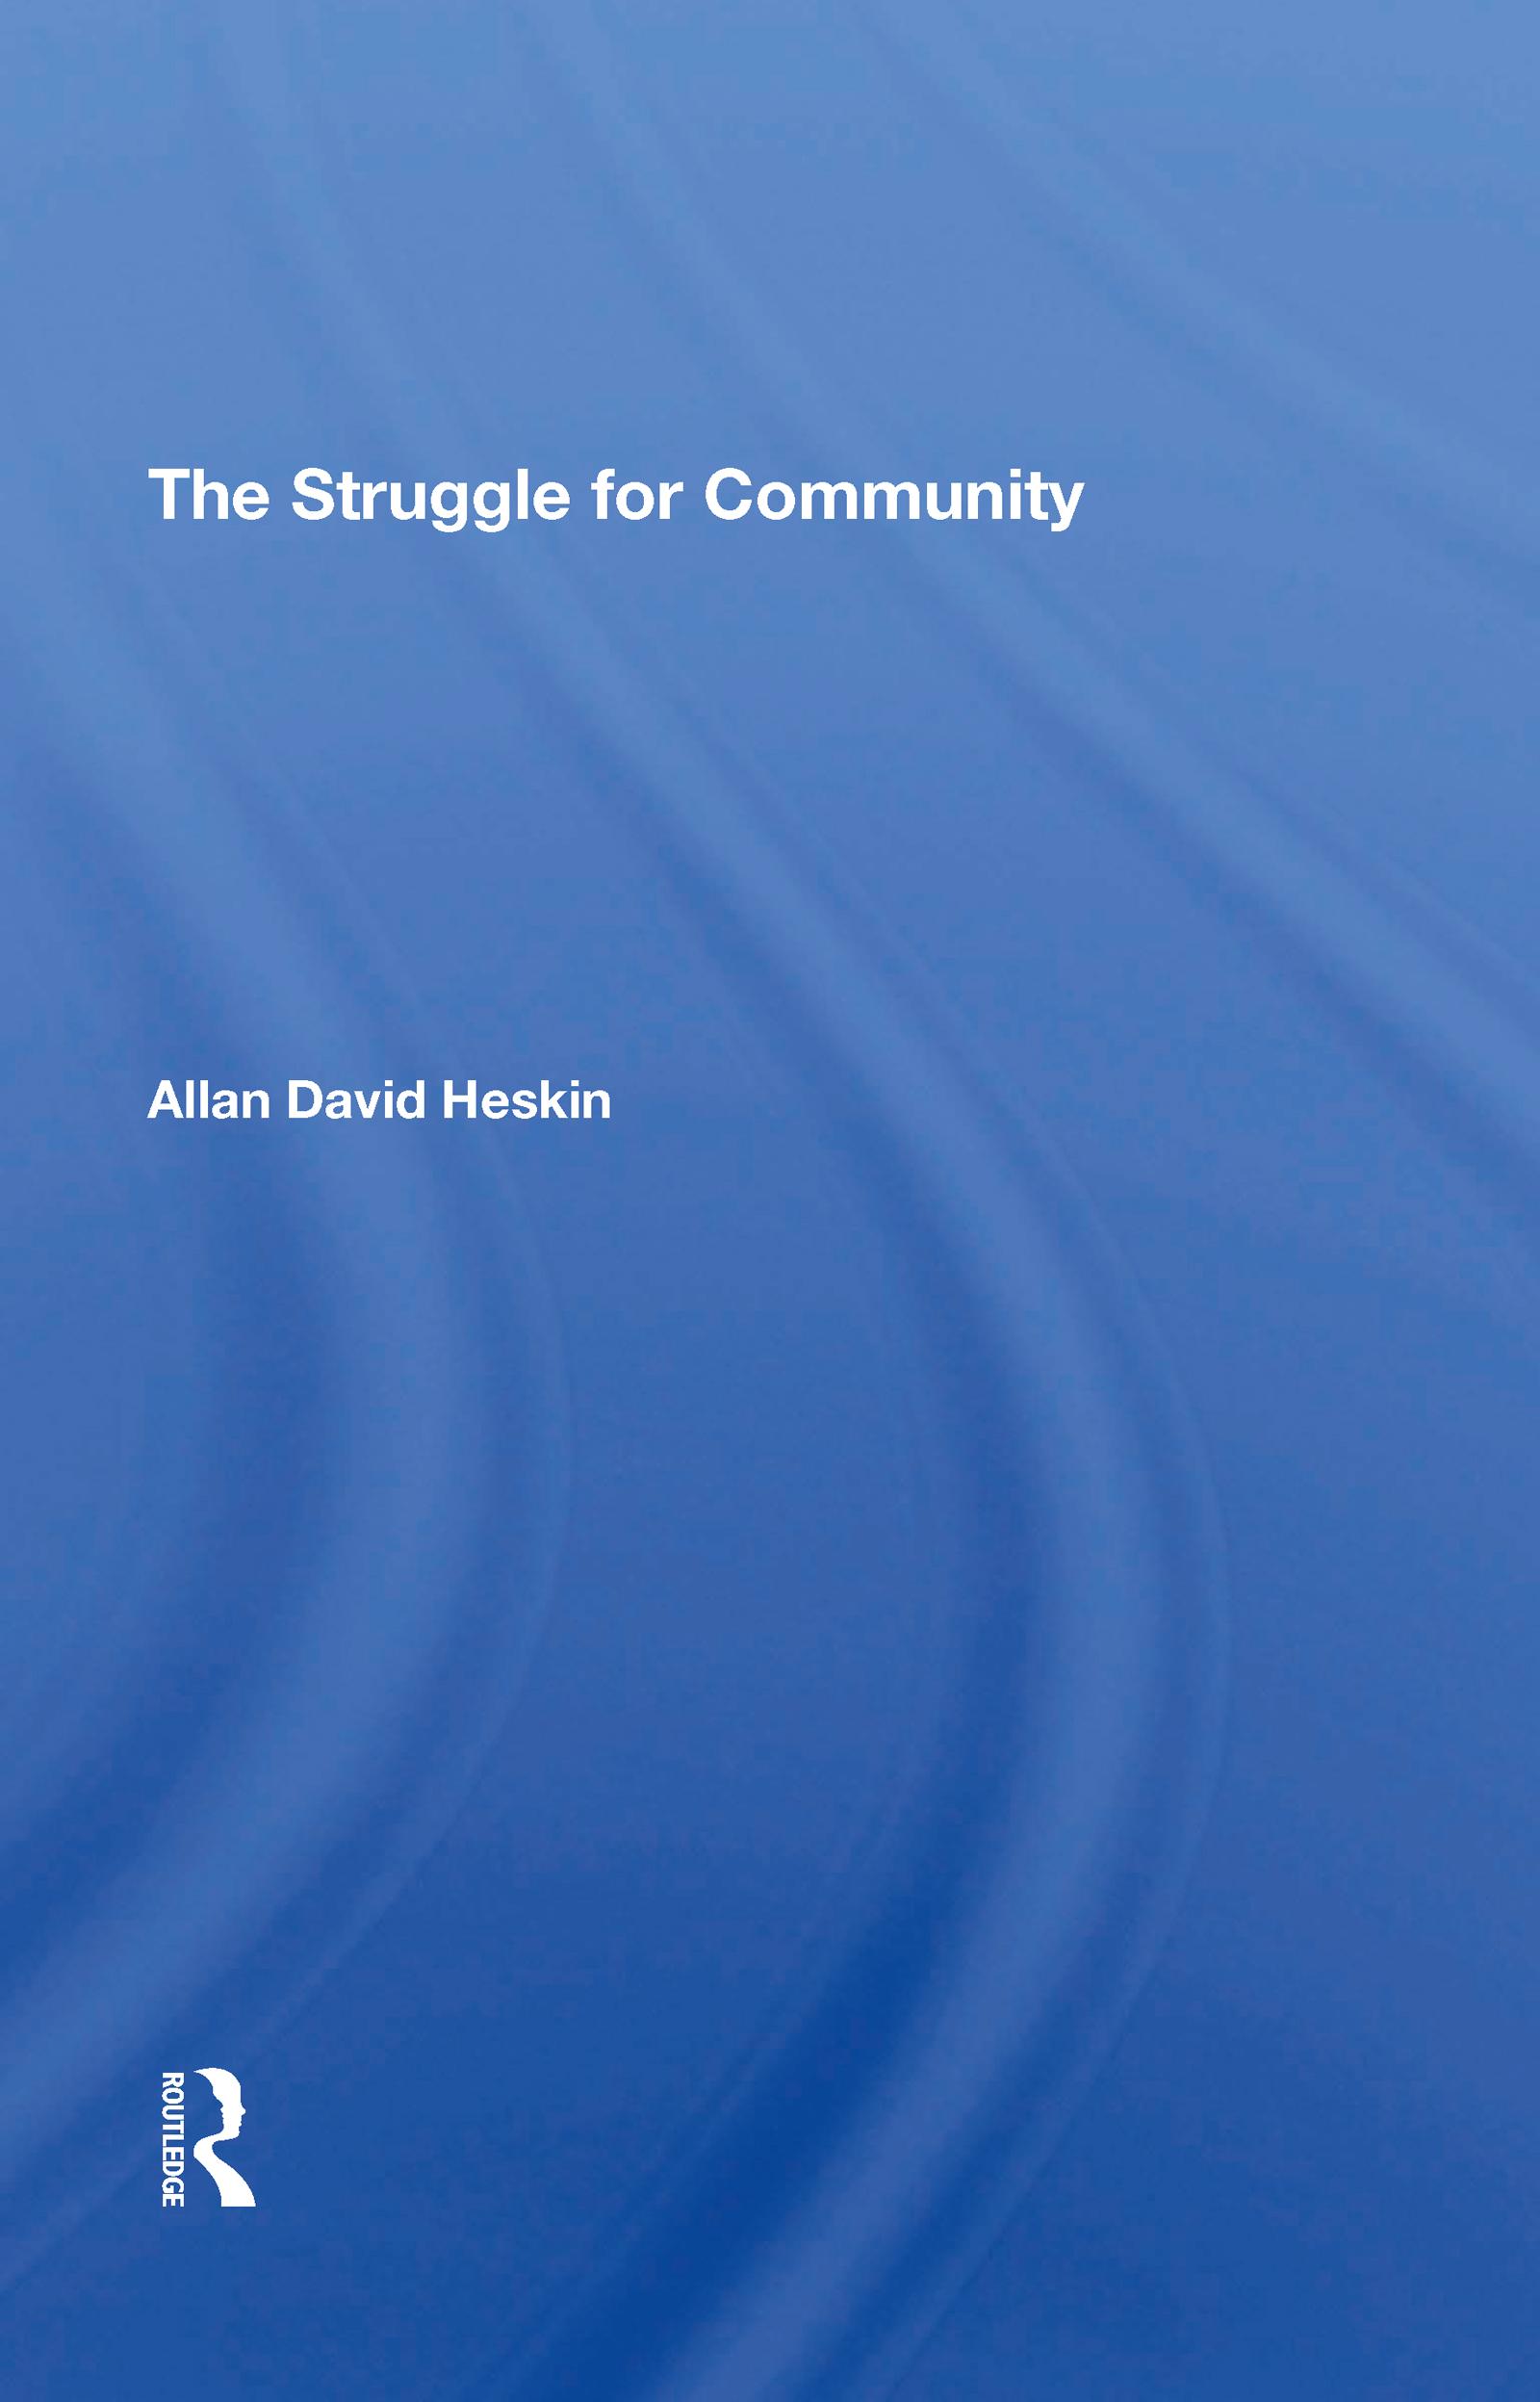 The Struggle For Community